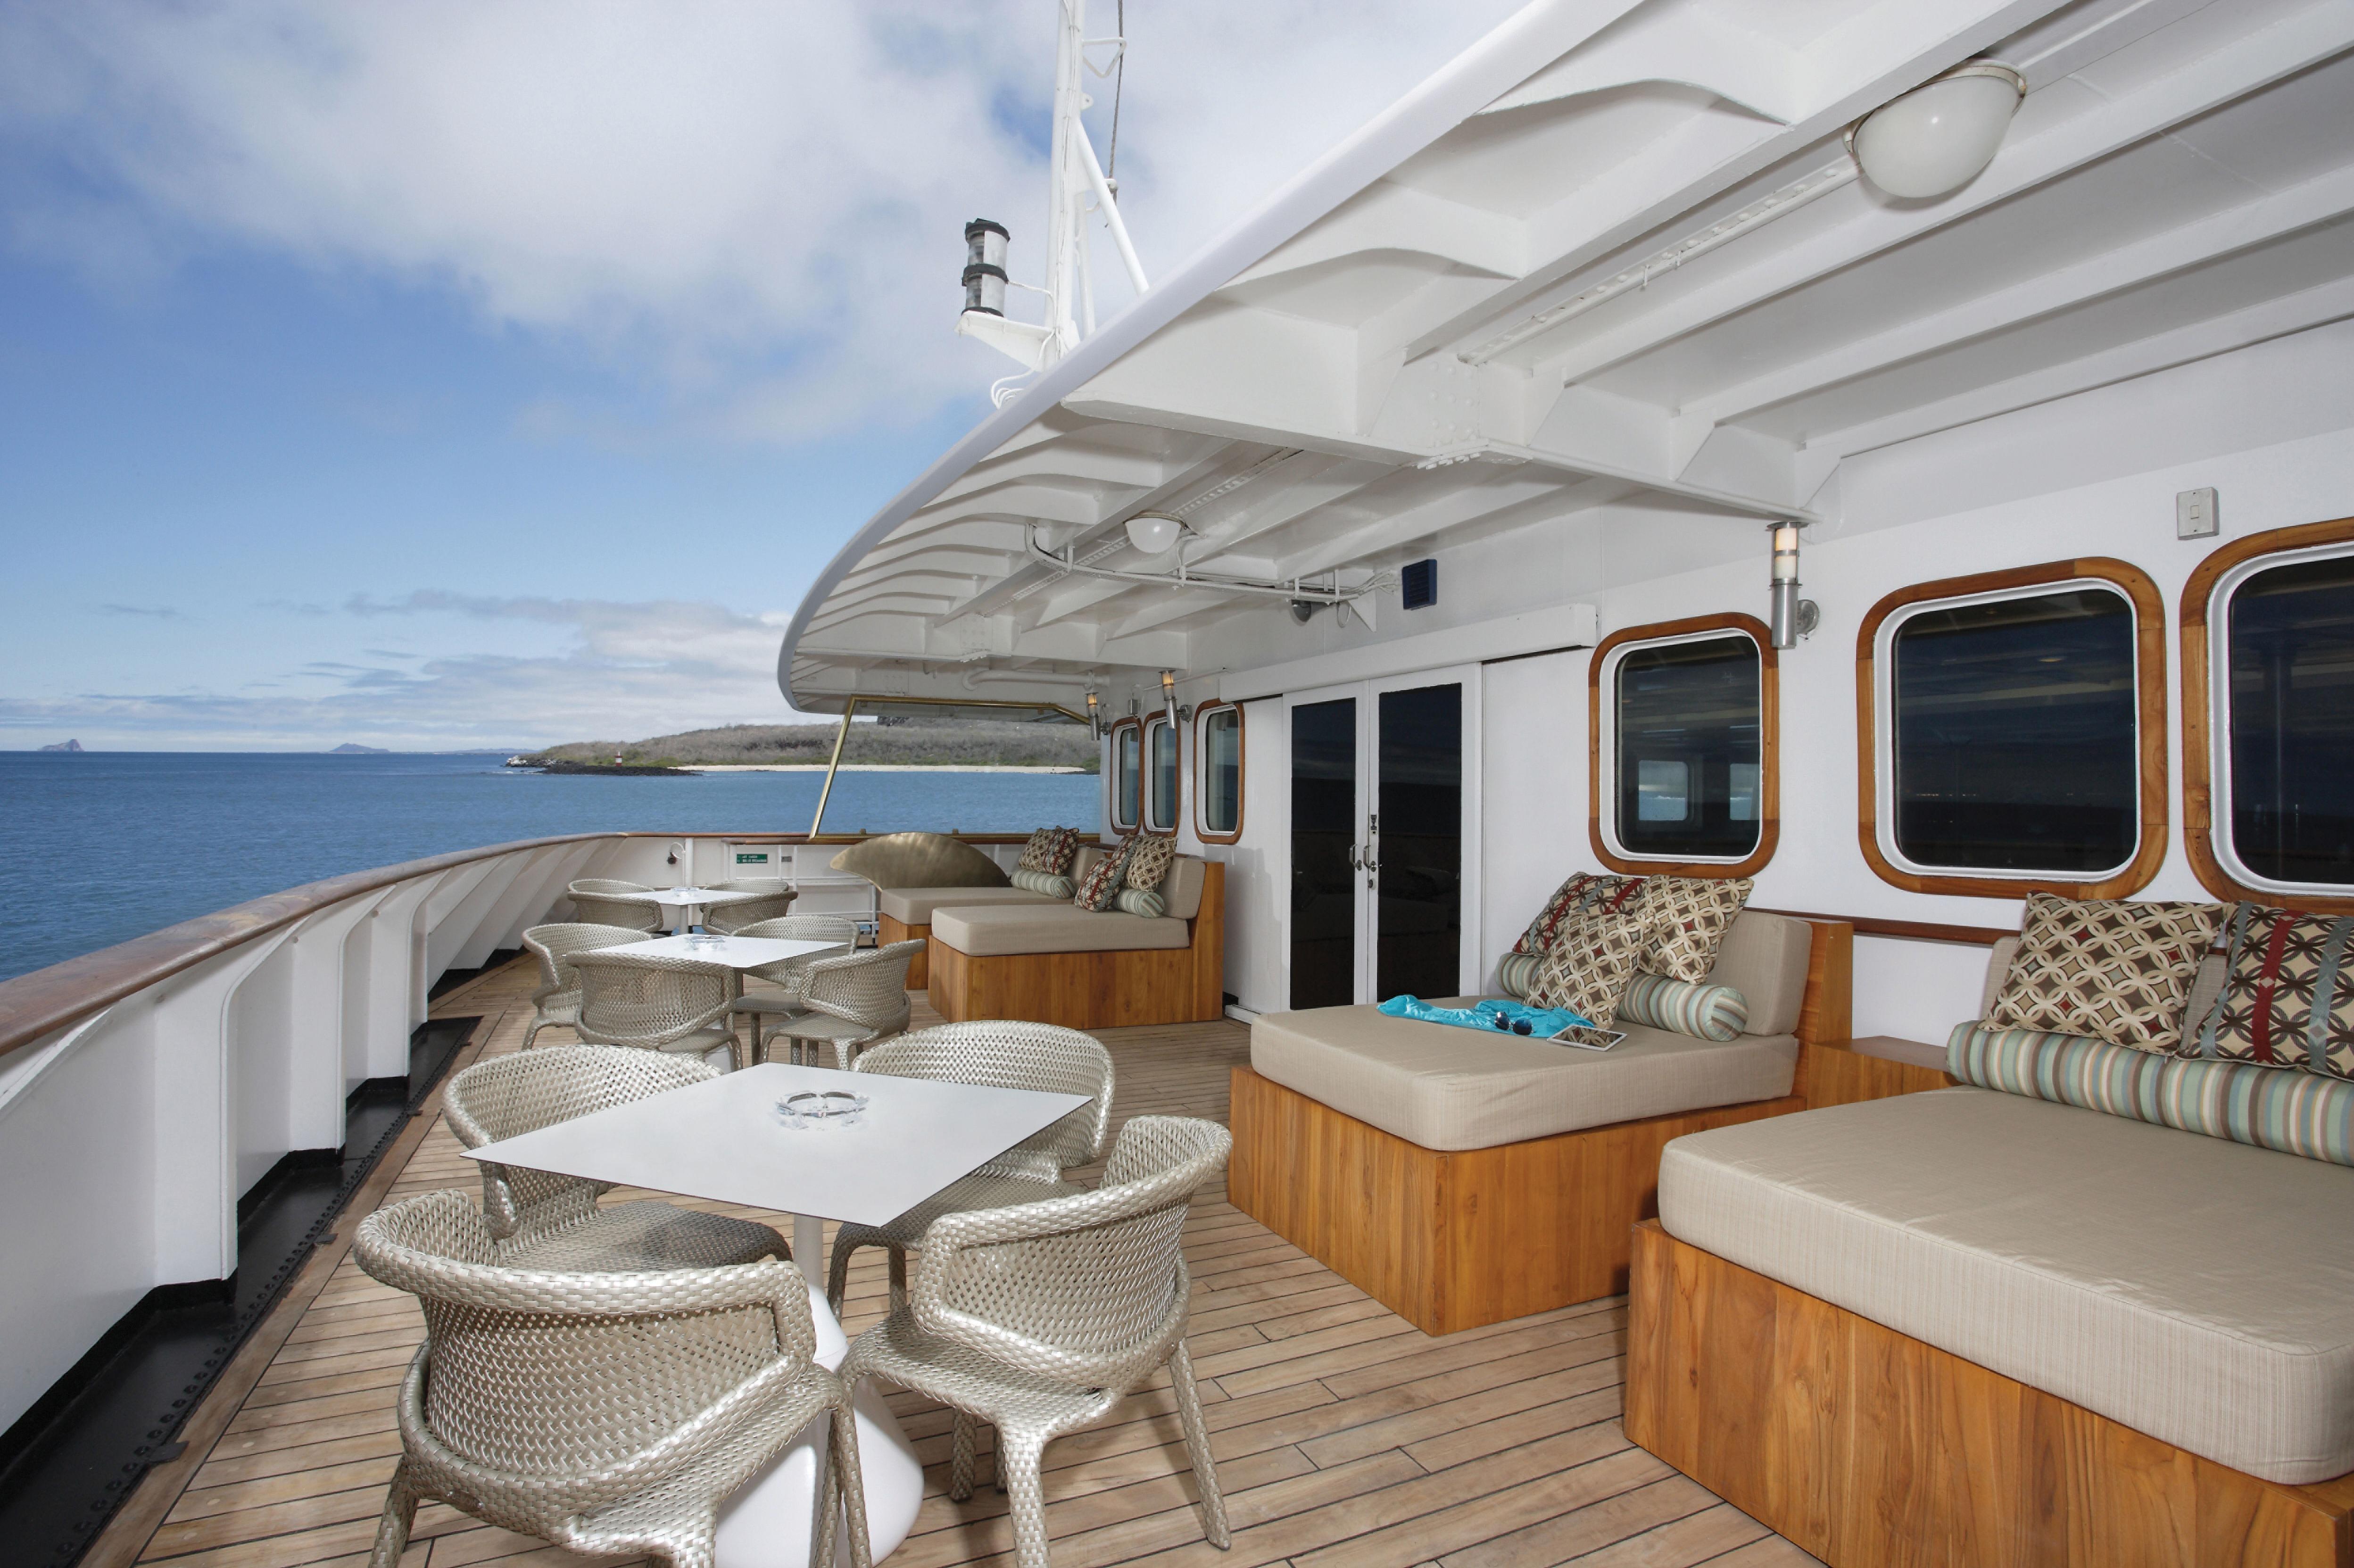 Silver Galapagos - Deck